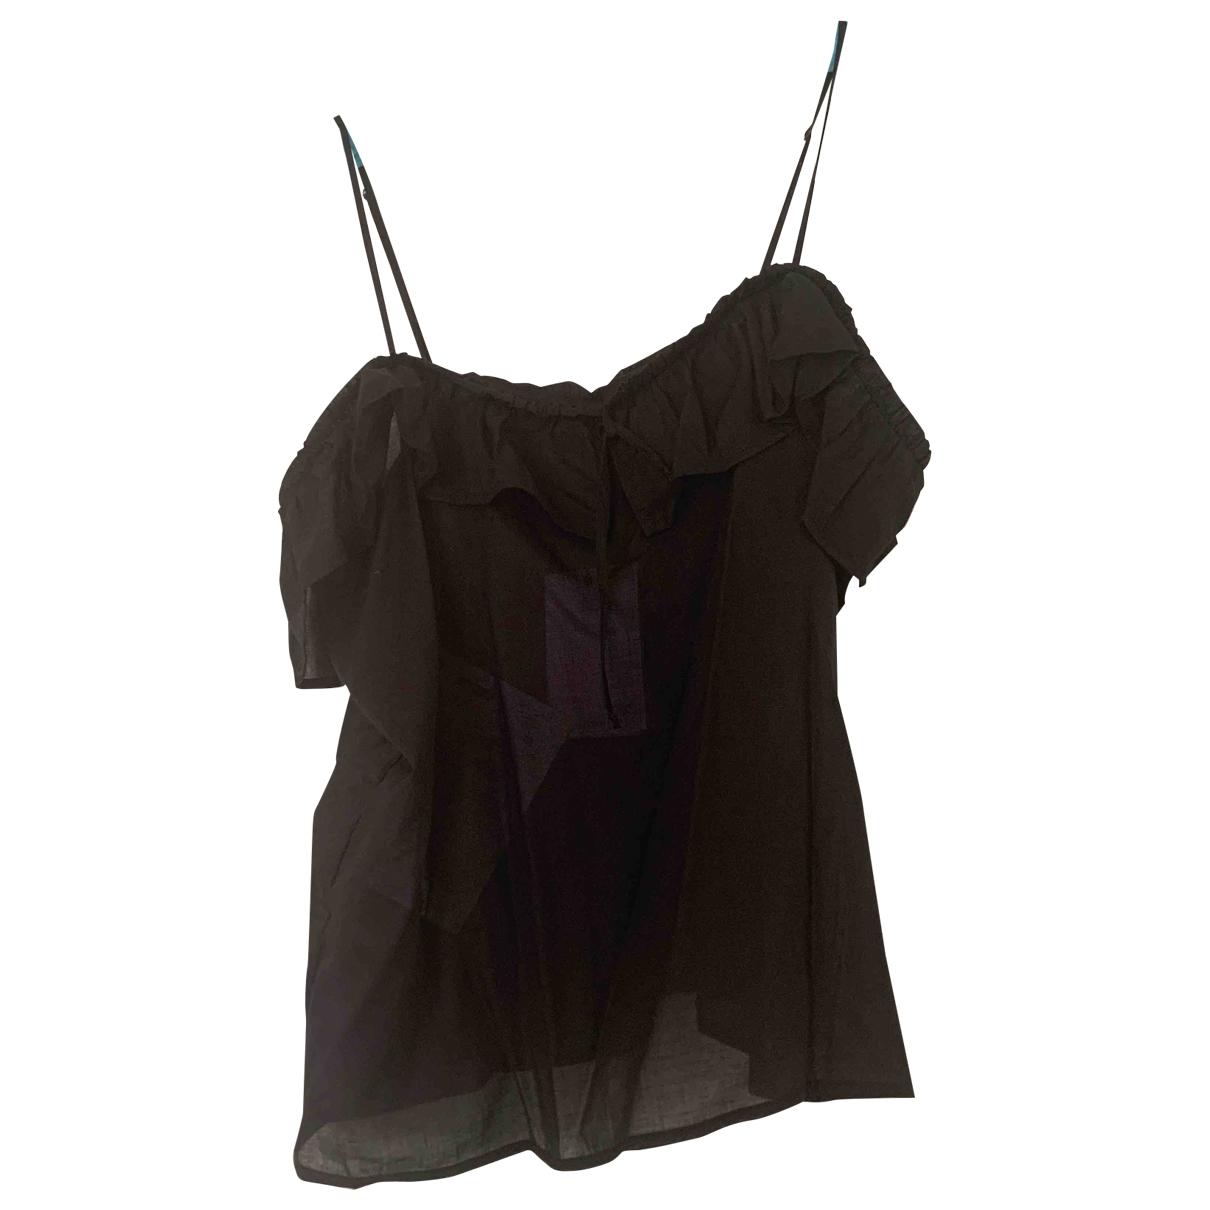 Anine Bing \N Black Cotton  top for Women XS International